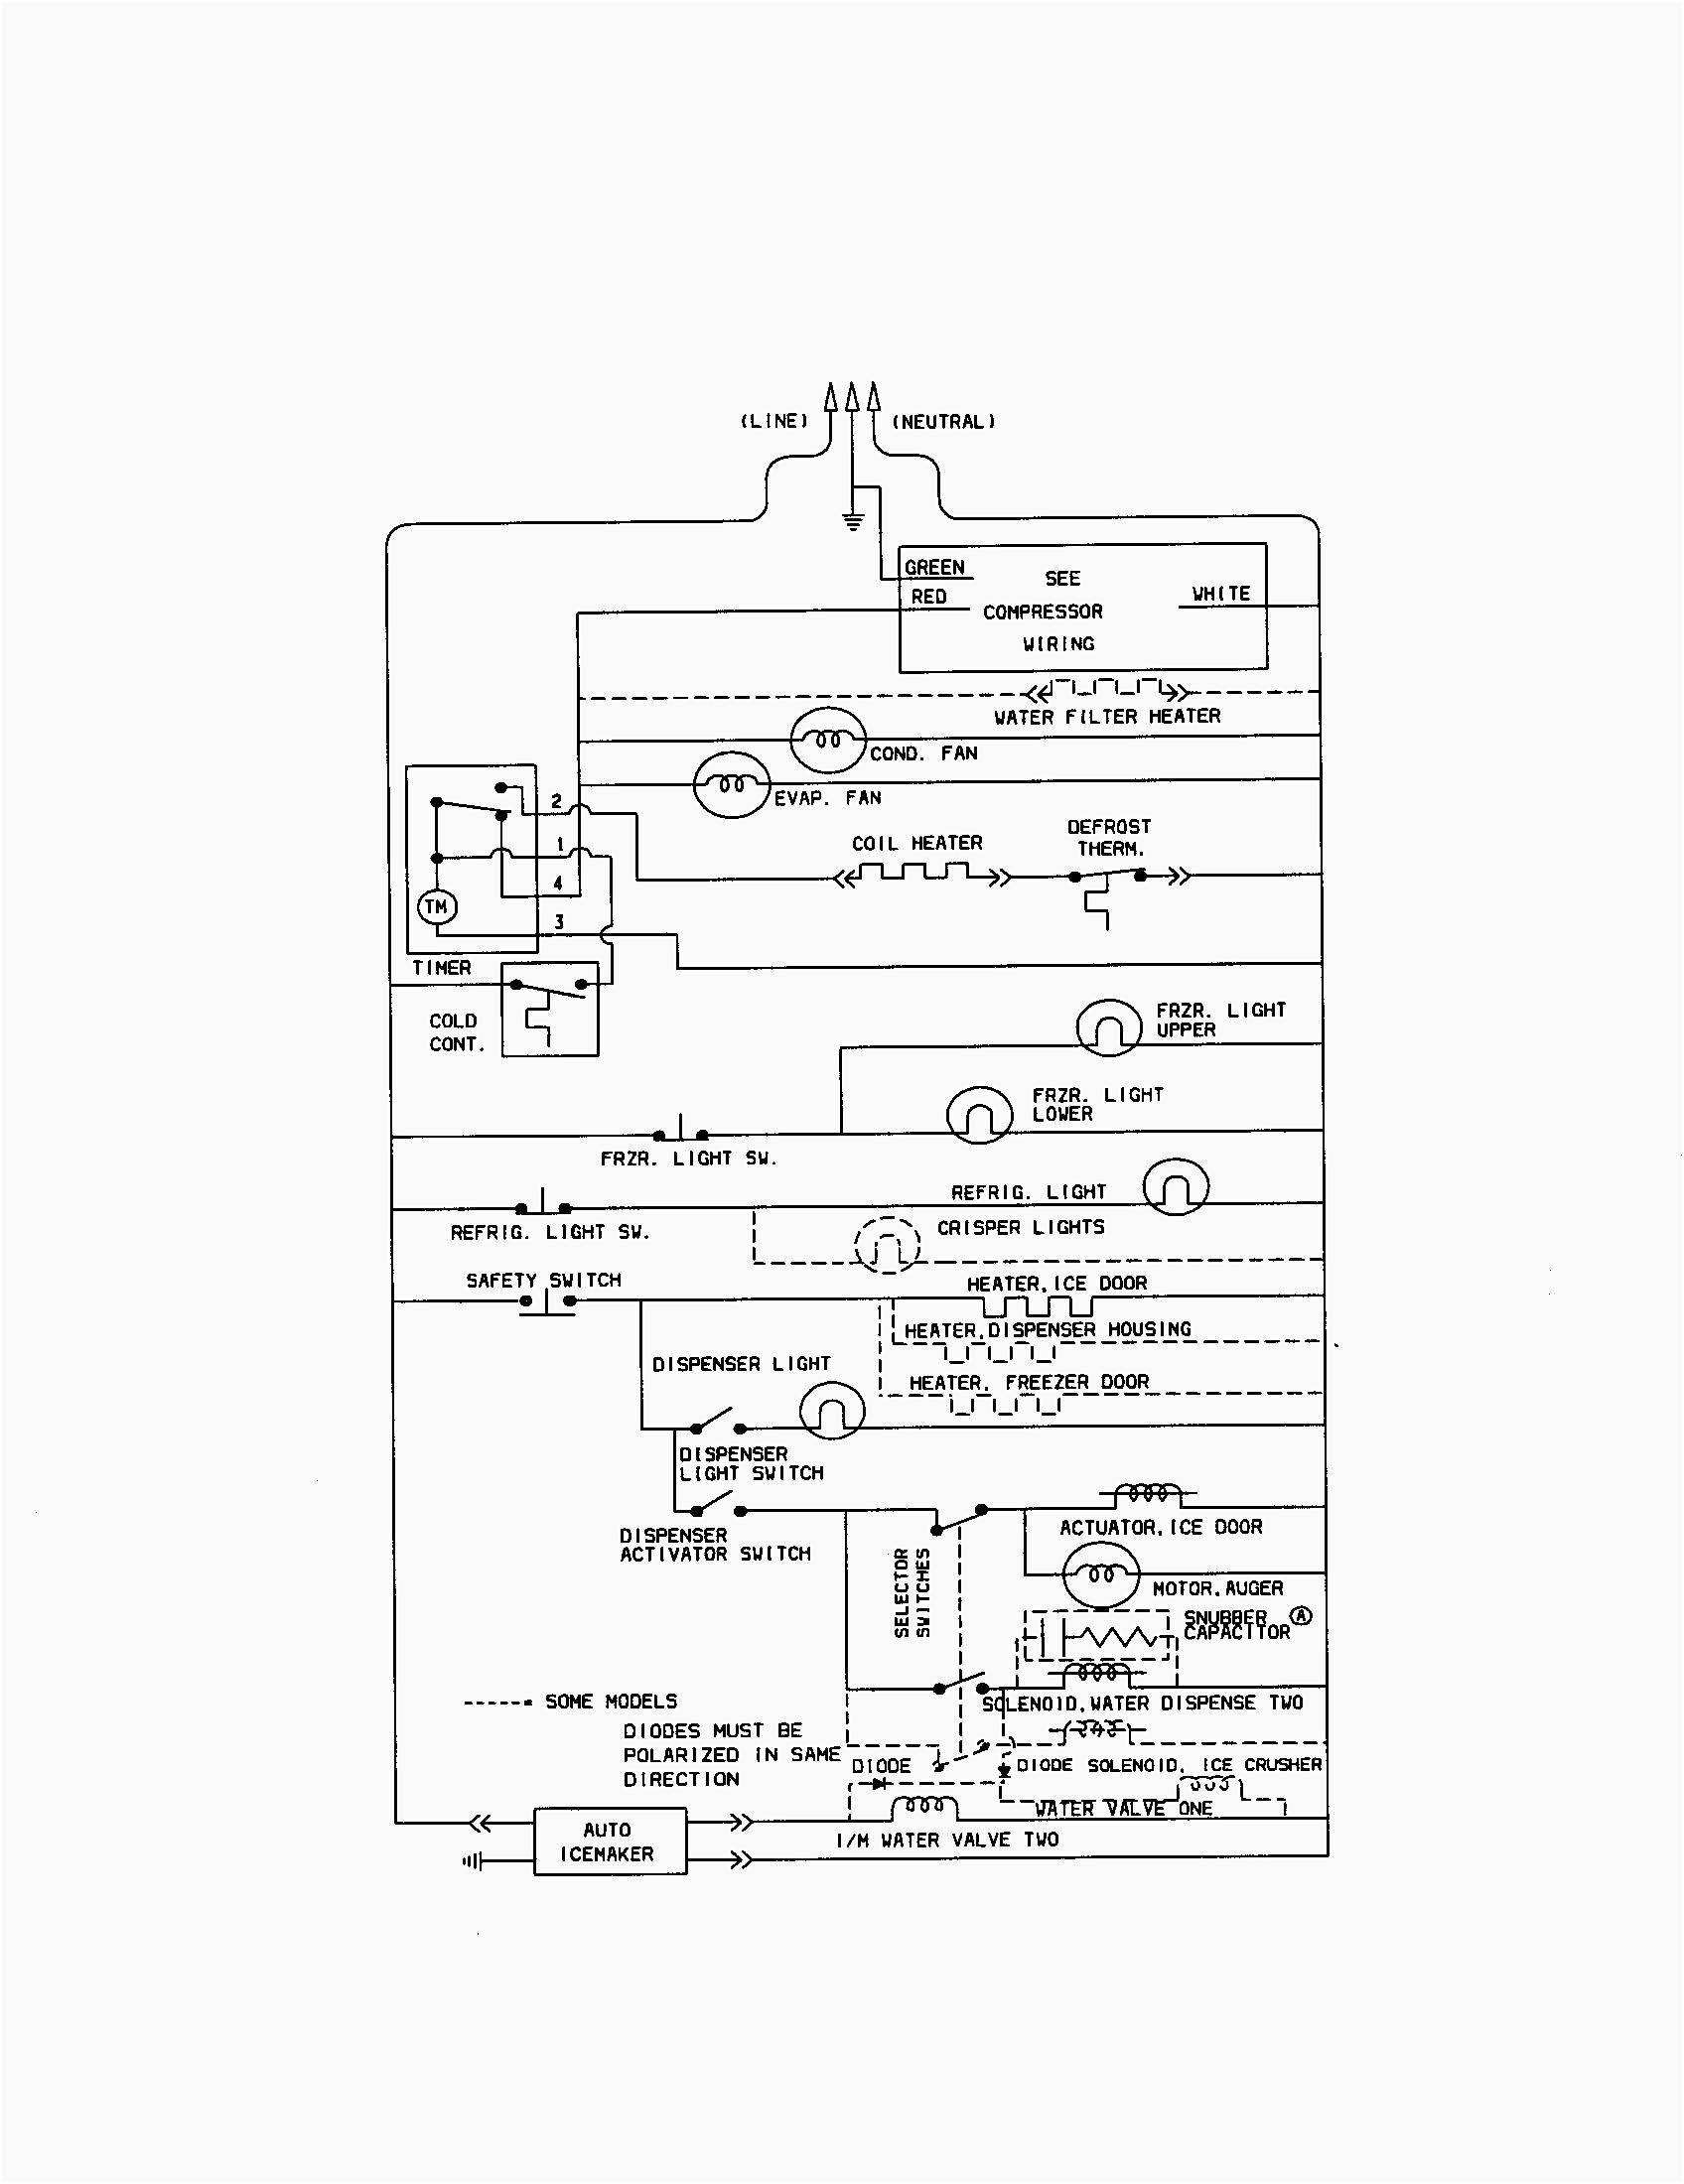 Kenmore Side by Side Refrigerator Wiring Diagram Download | Wiring ...